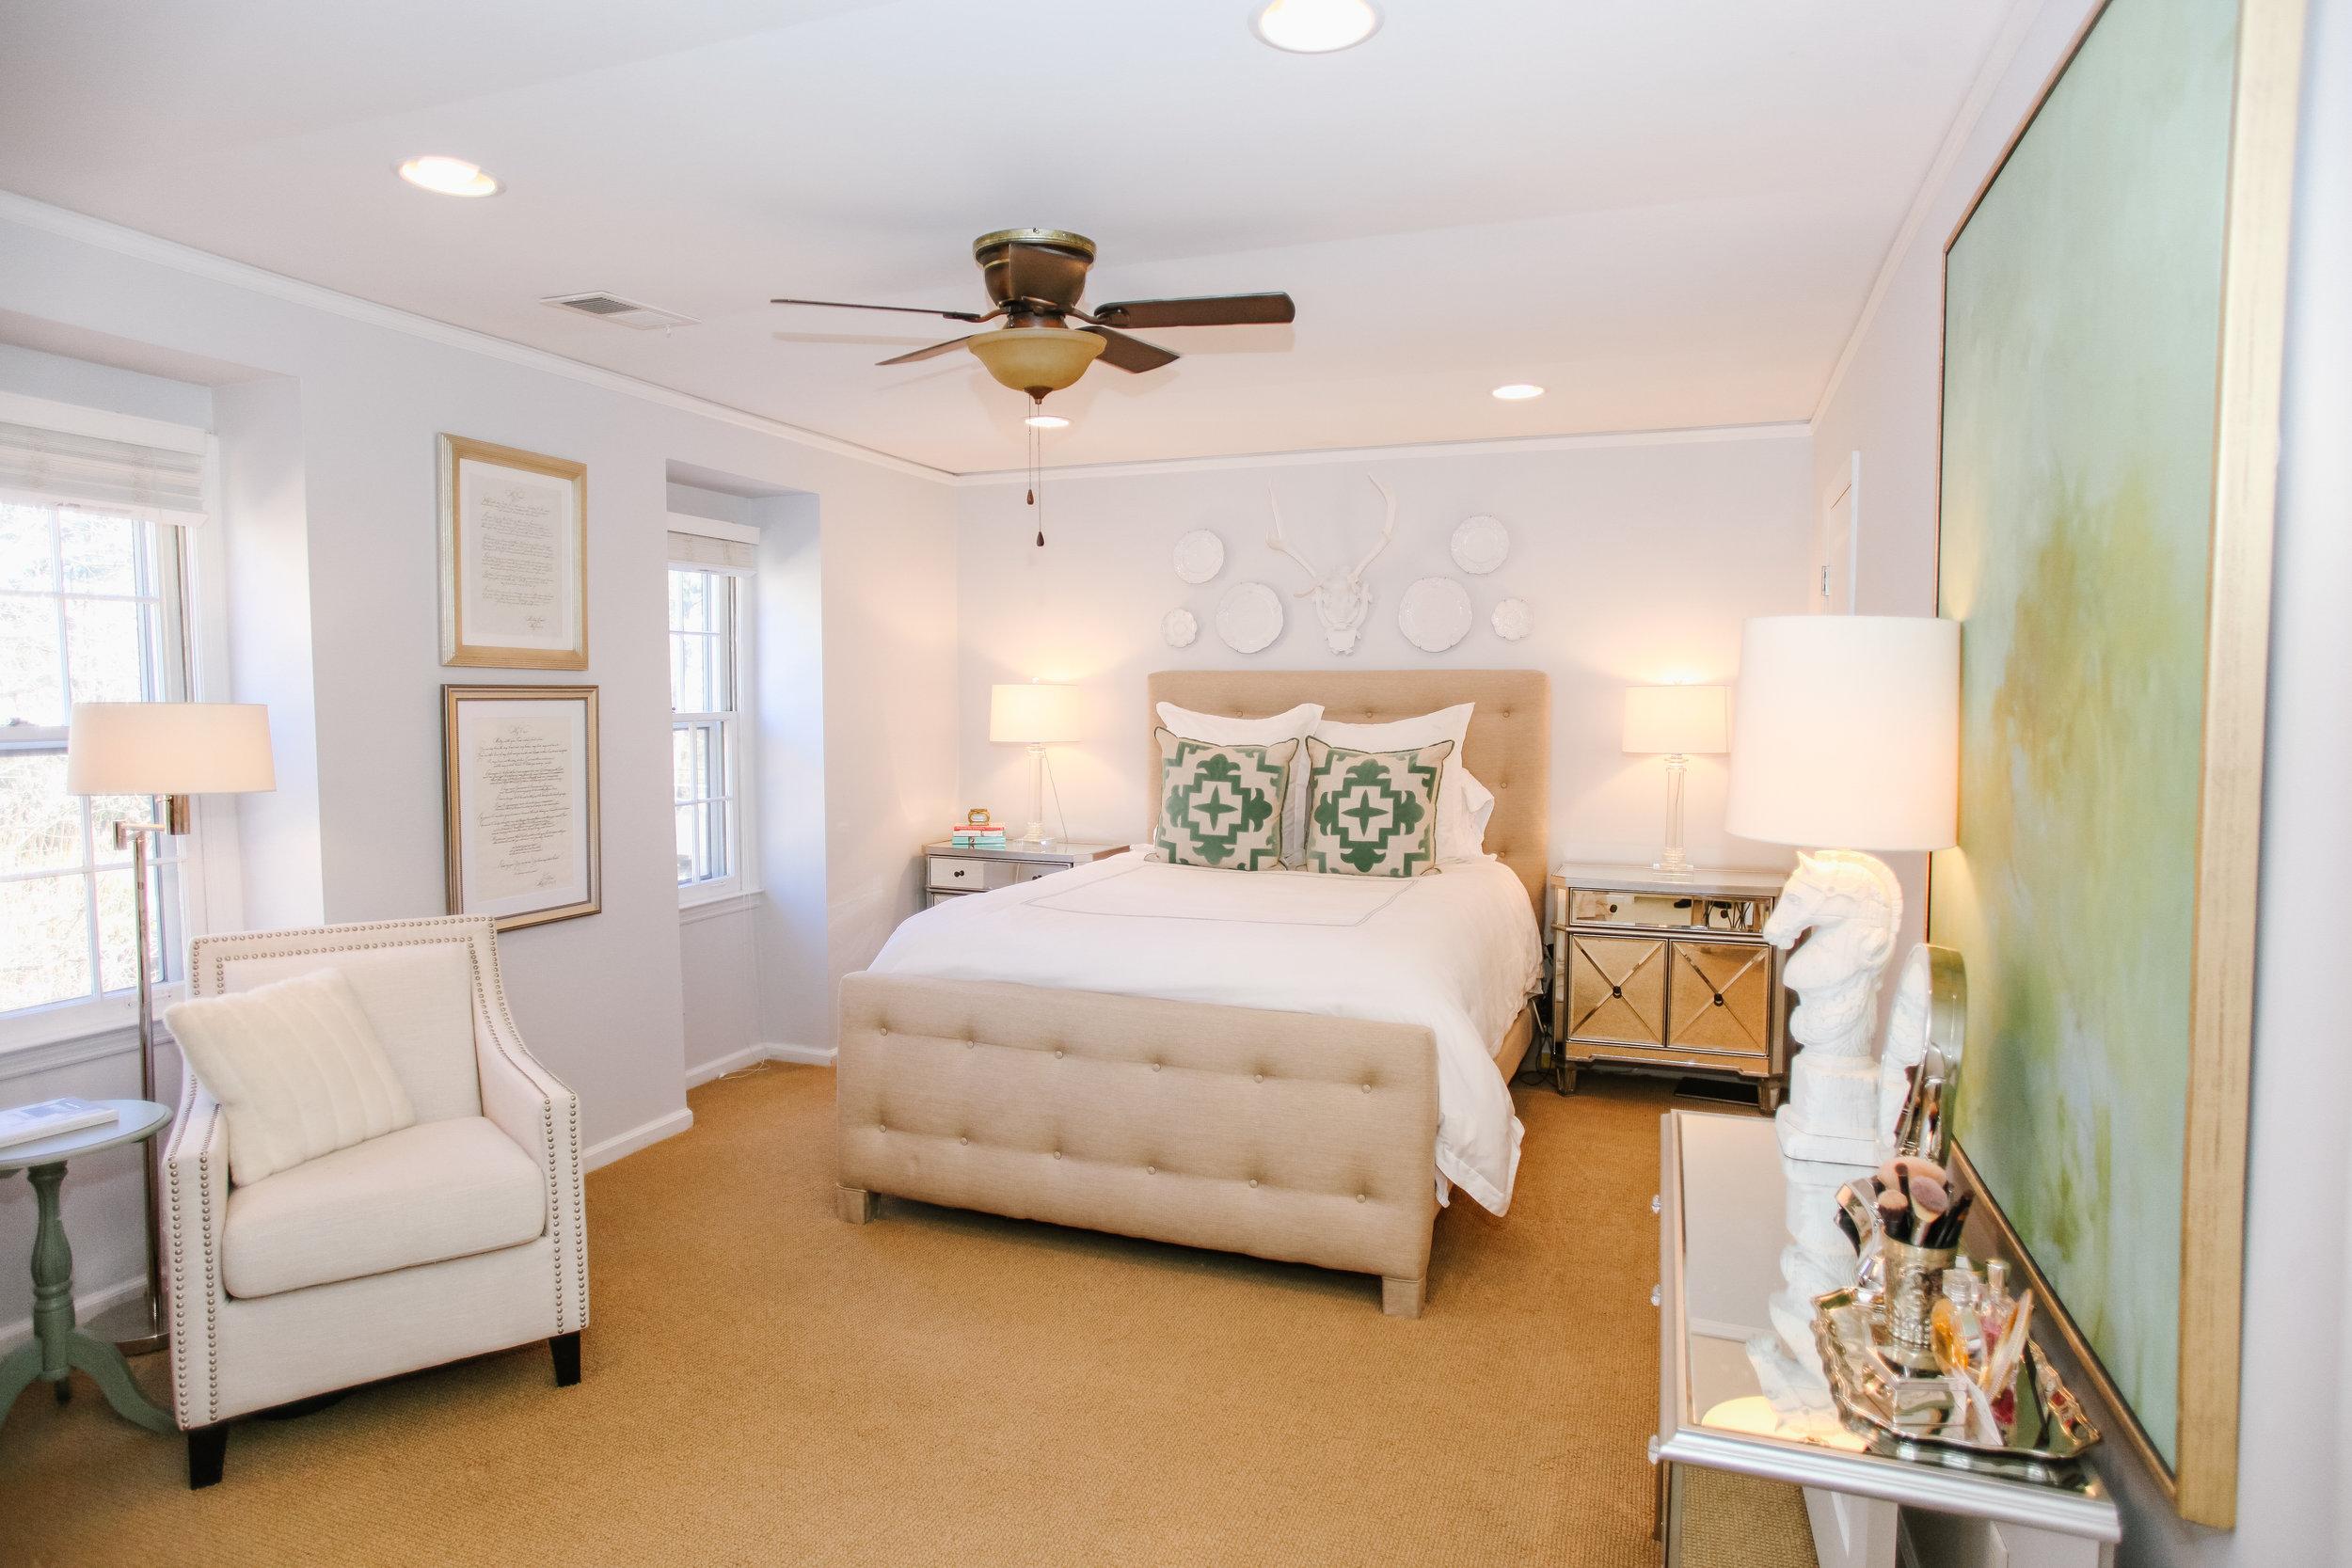 wingard-real-estate-sandy-springs-dream-home-backyard-goals-atlanta-buckhead-13.jpg